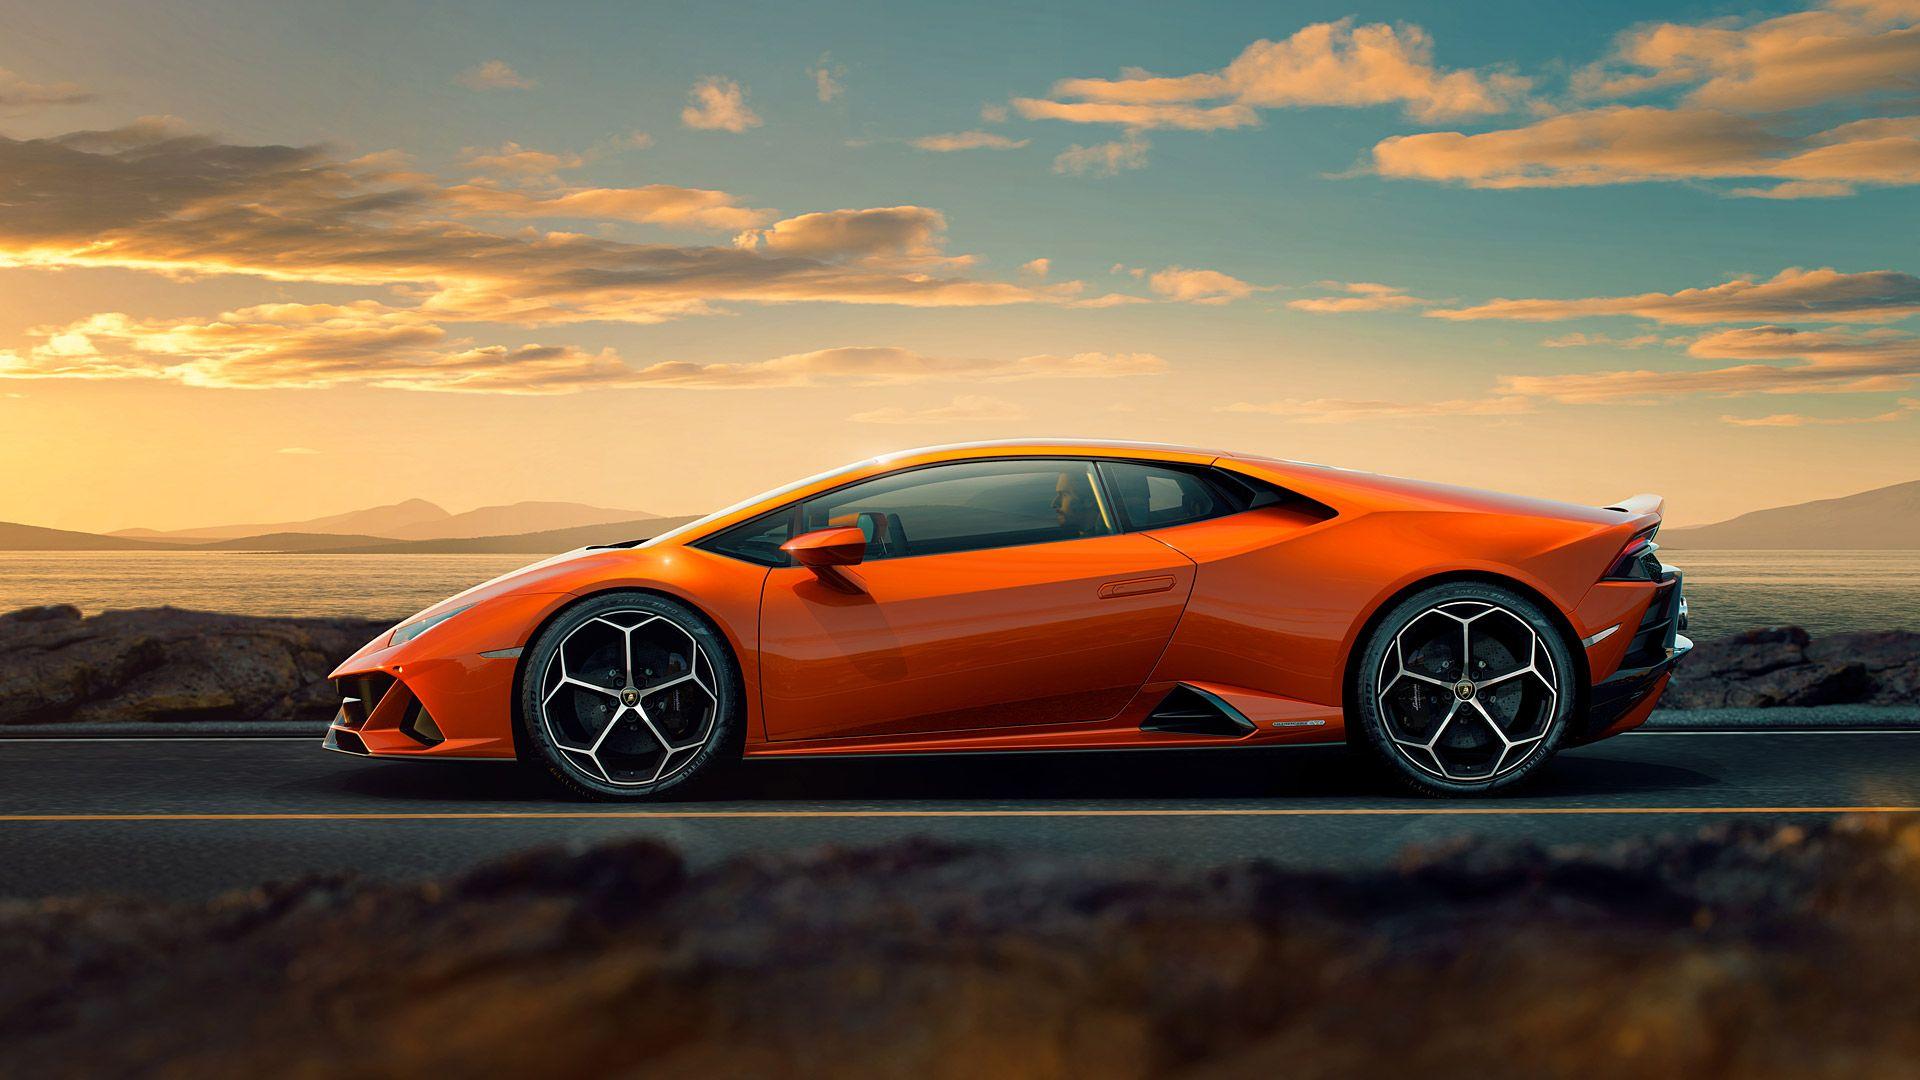 Lamborghini 2021 Model List Current Lineup Prices Lamborghini Huracan Lamborghini Models Car Side View